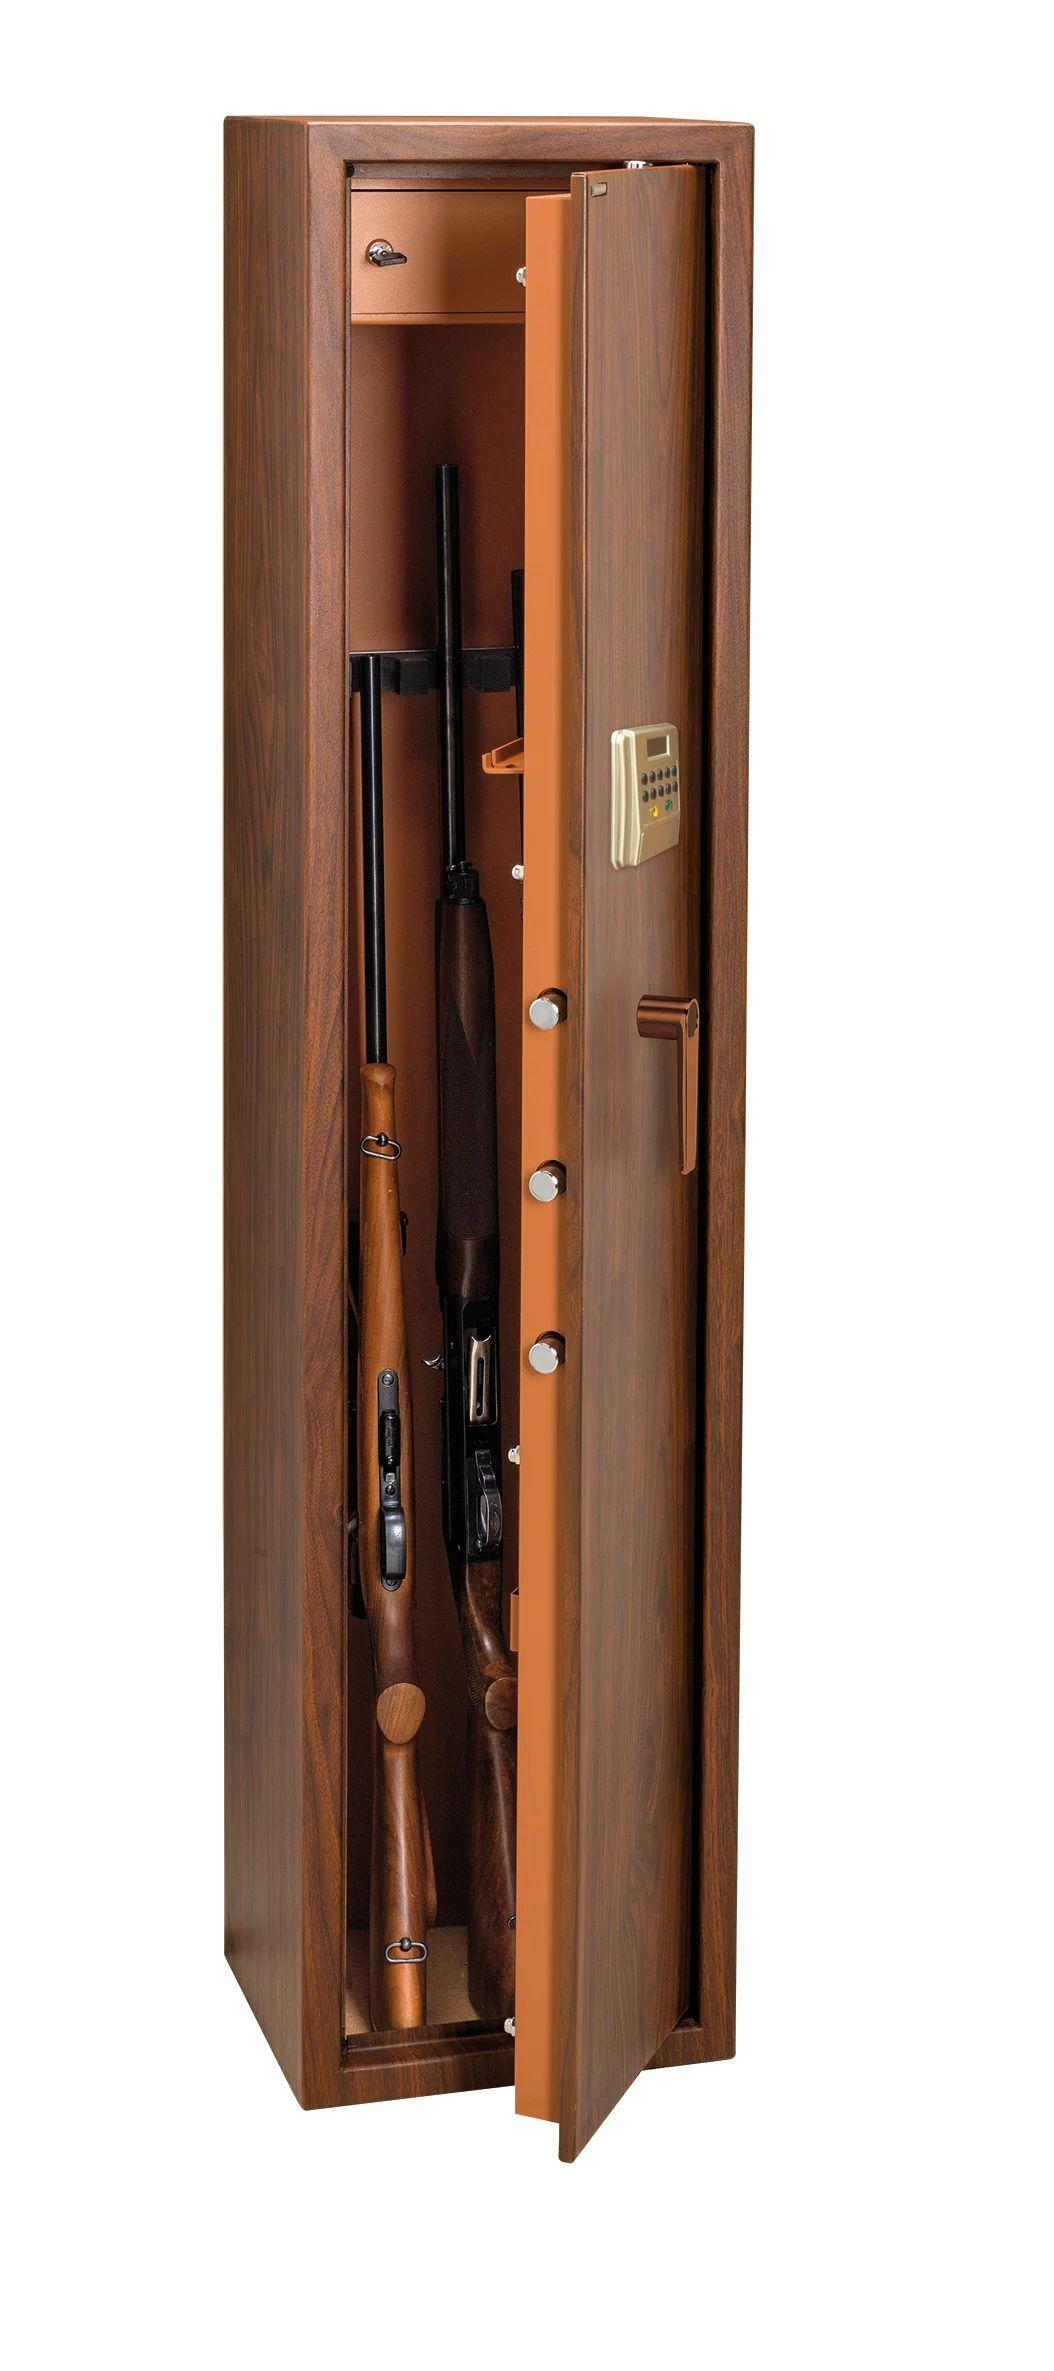 Armoire A Fusils A Code 5 Fusils Technosafe H 145 X L 34 X P 28 Cm Leroy Merlin